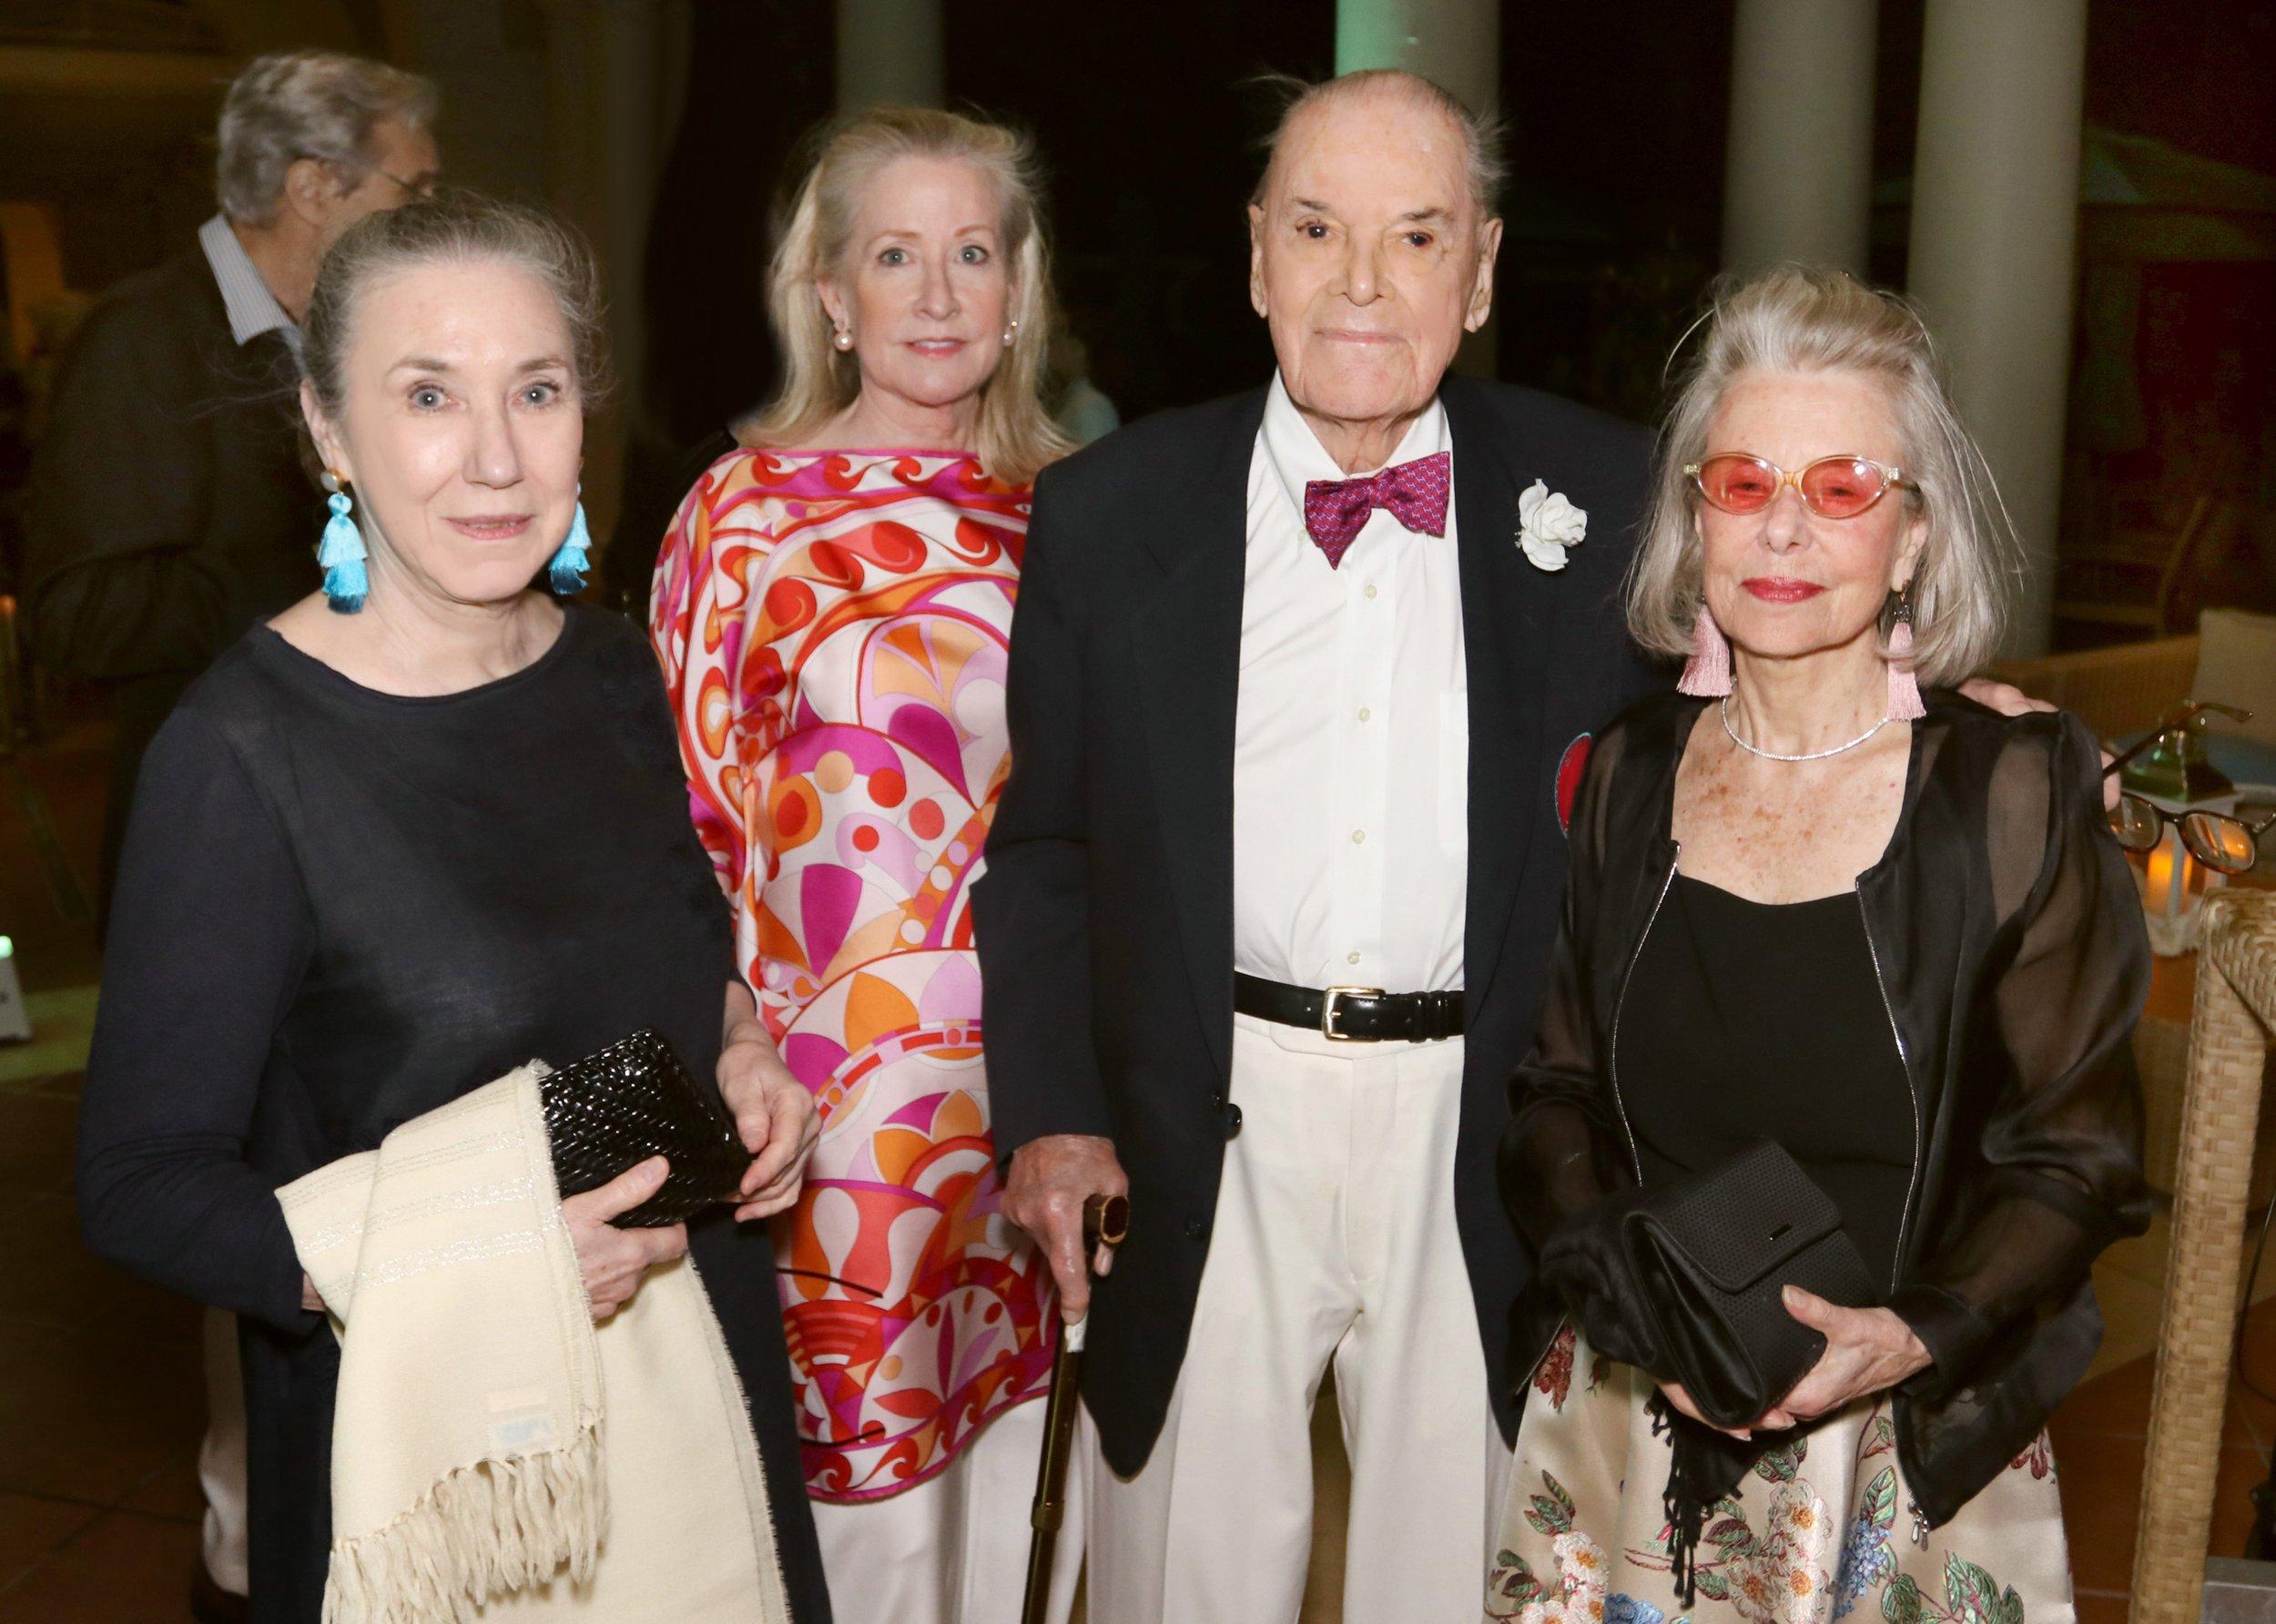 Joan Rosasco, Mia Glickman, Henry Darlington, Carla Darlington